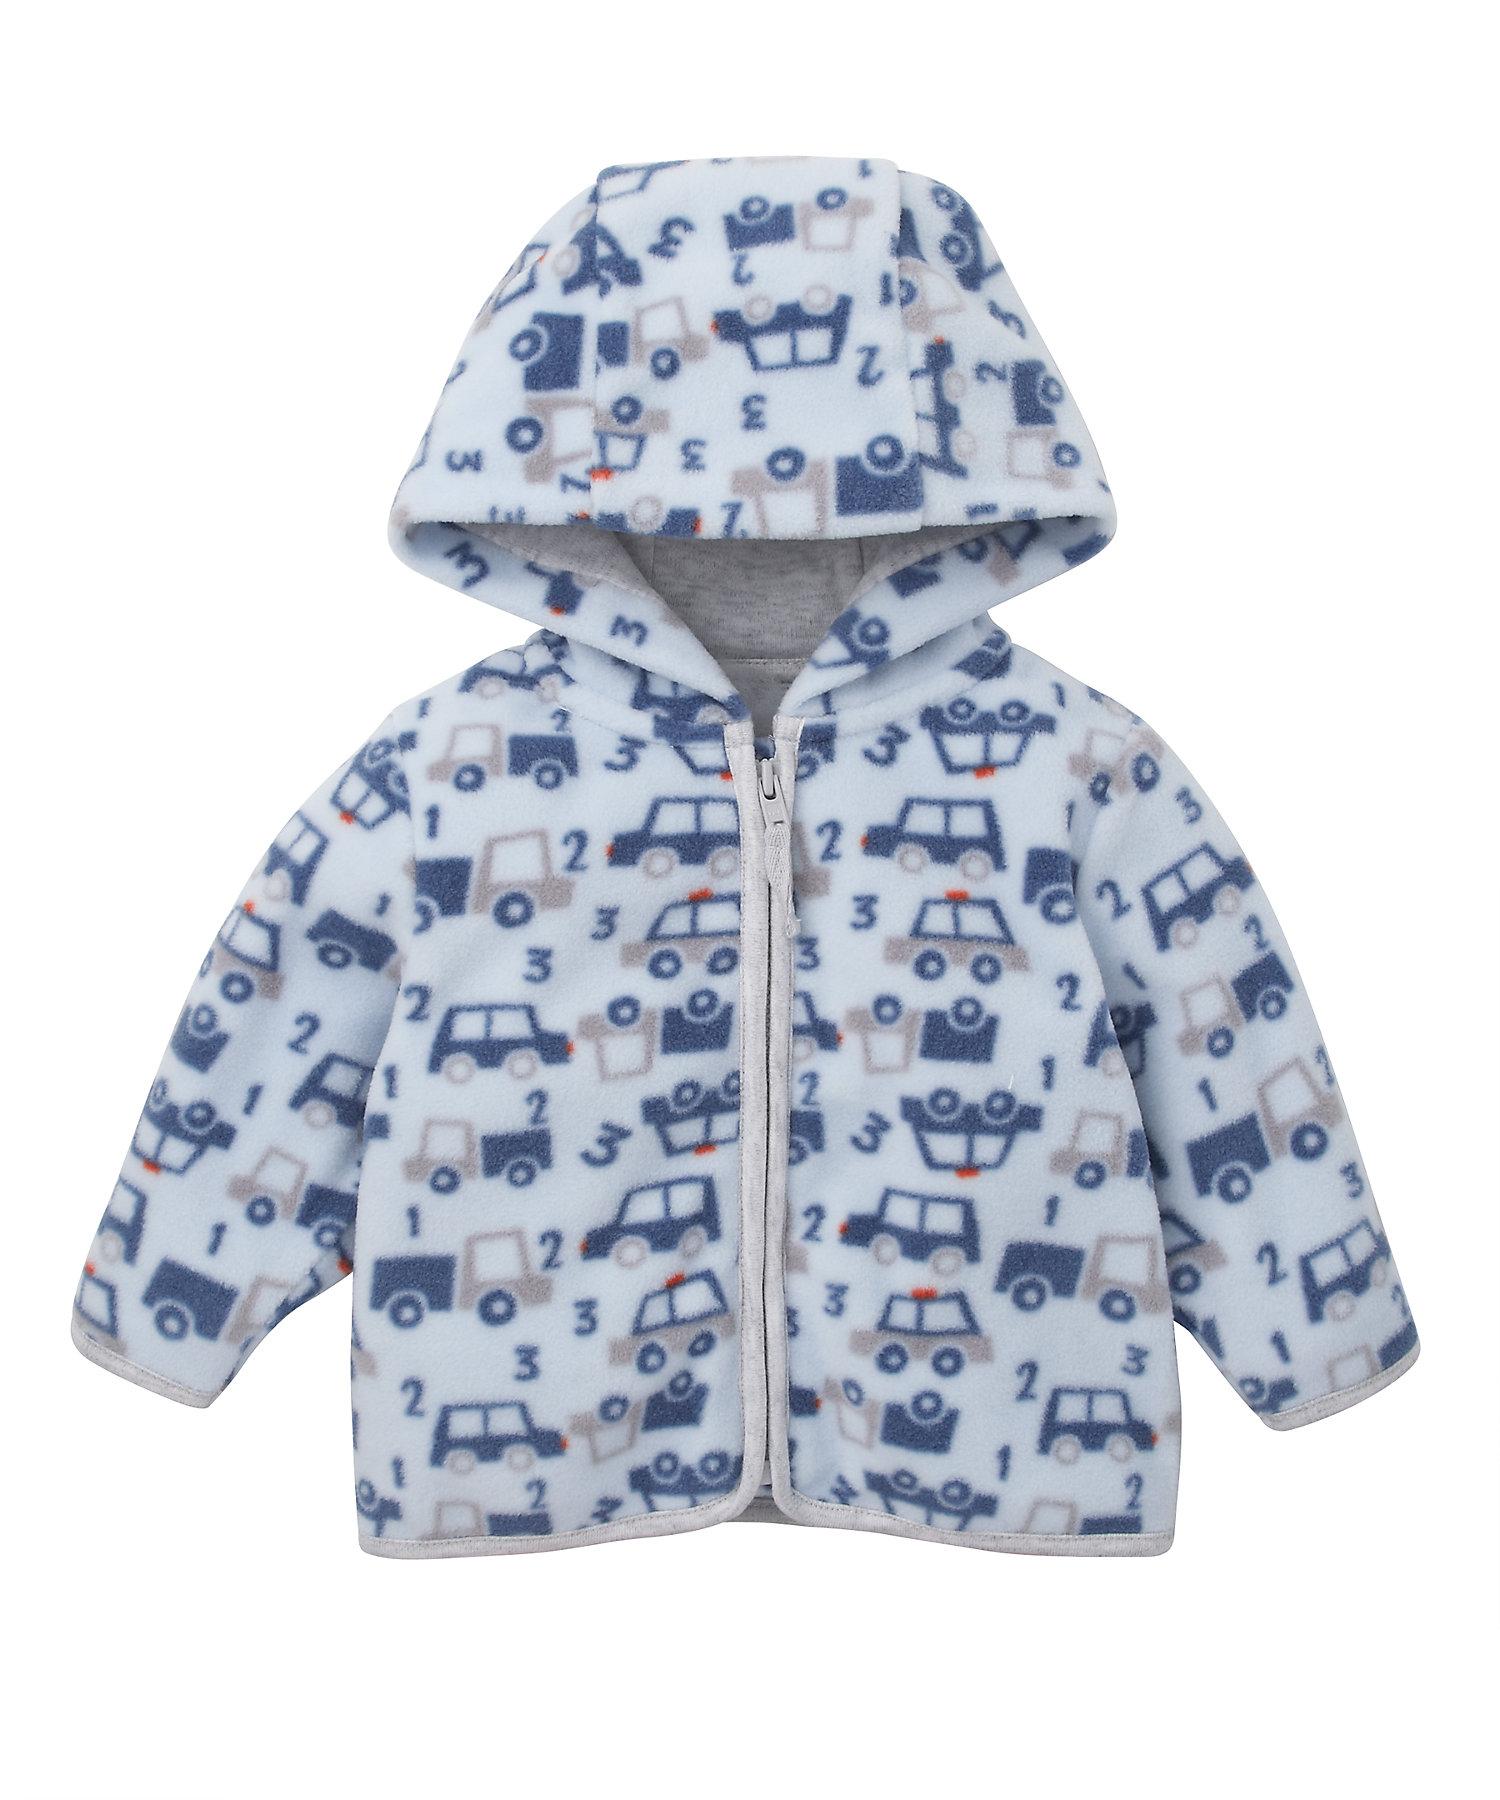 Mothercare   Boys Full Sleeves Fleece Jacket Car Print - Blue